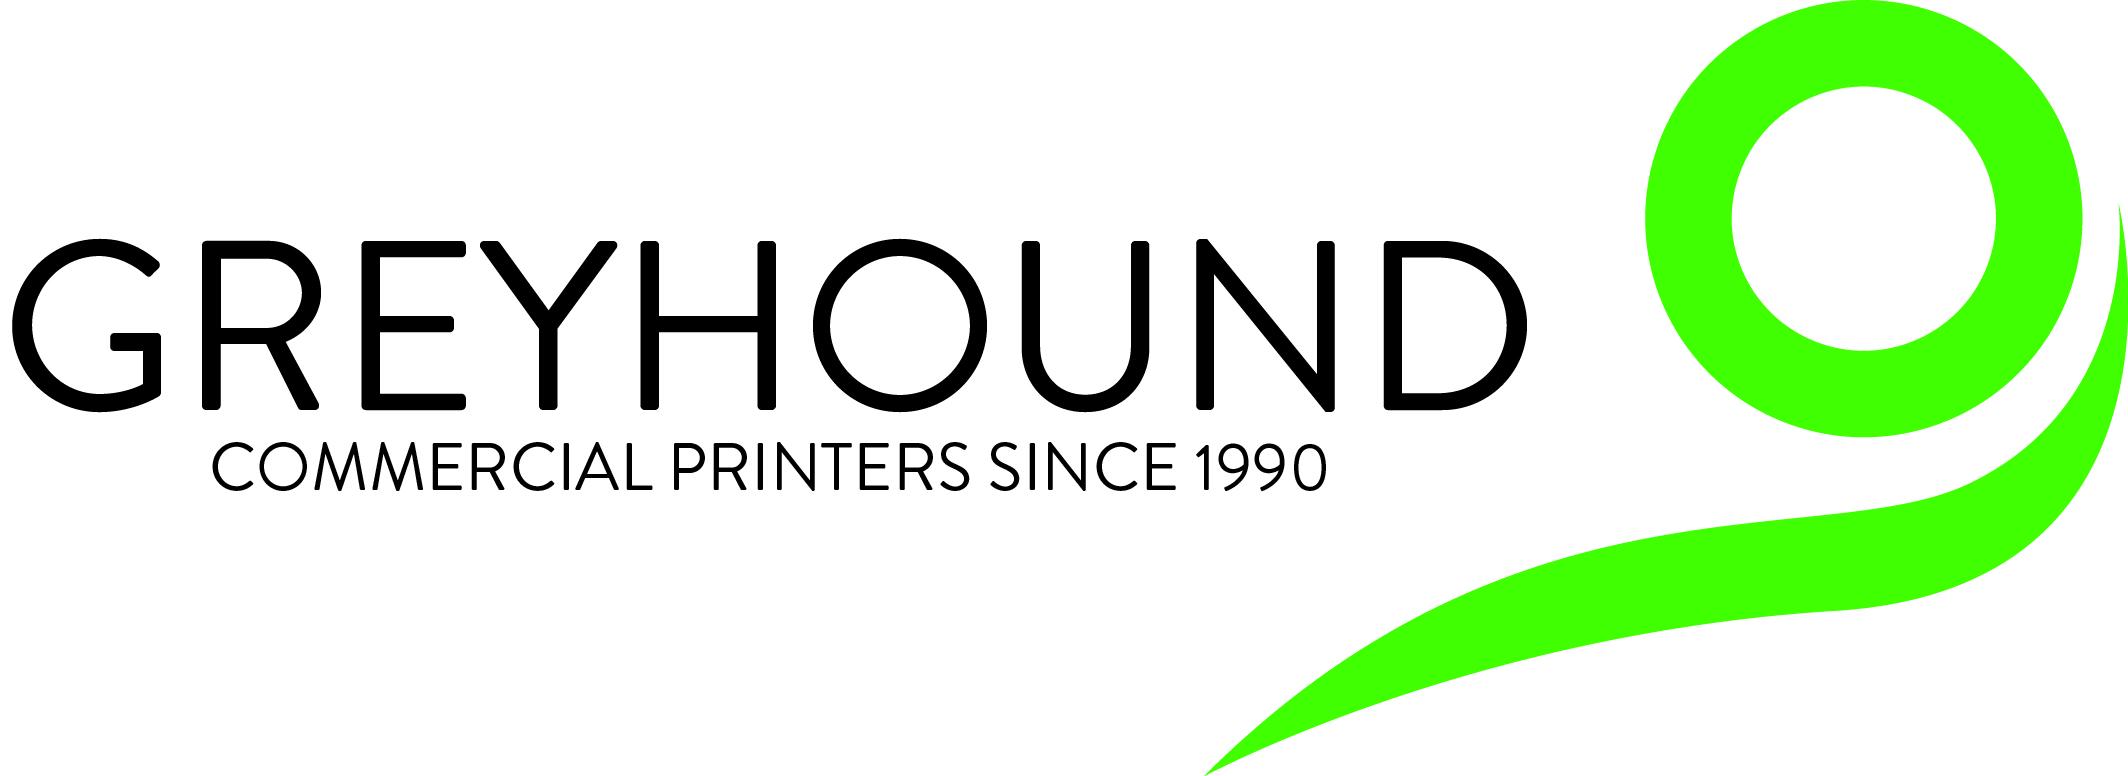 Greyhound Printing